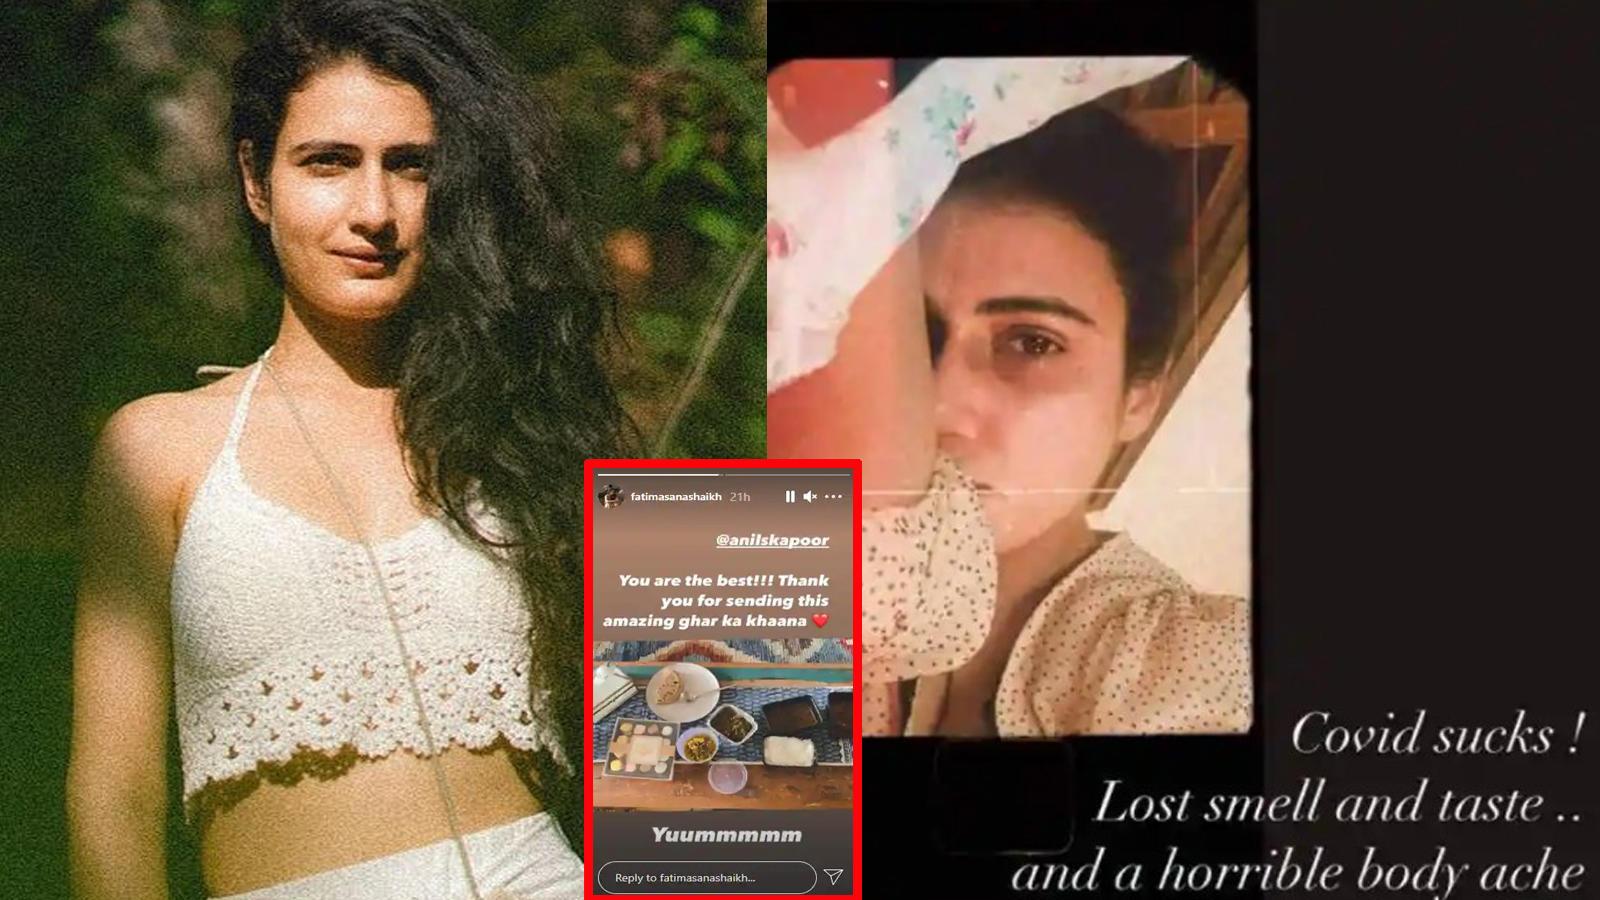 'Covid sucks, Lost smell and taste' writes Fatima Sana Shaikh as she fights coronavirus, also thanks Anil Kapoor for sending her 'amazing ghar ka khaana' | Hindi Movie News – Bollywood – Times of India